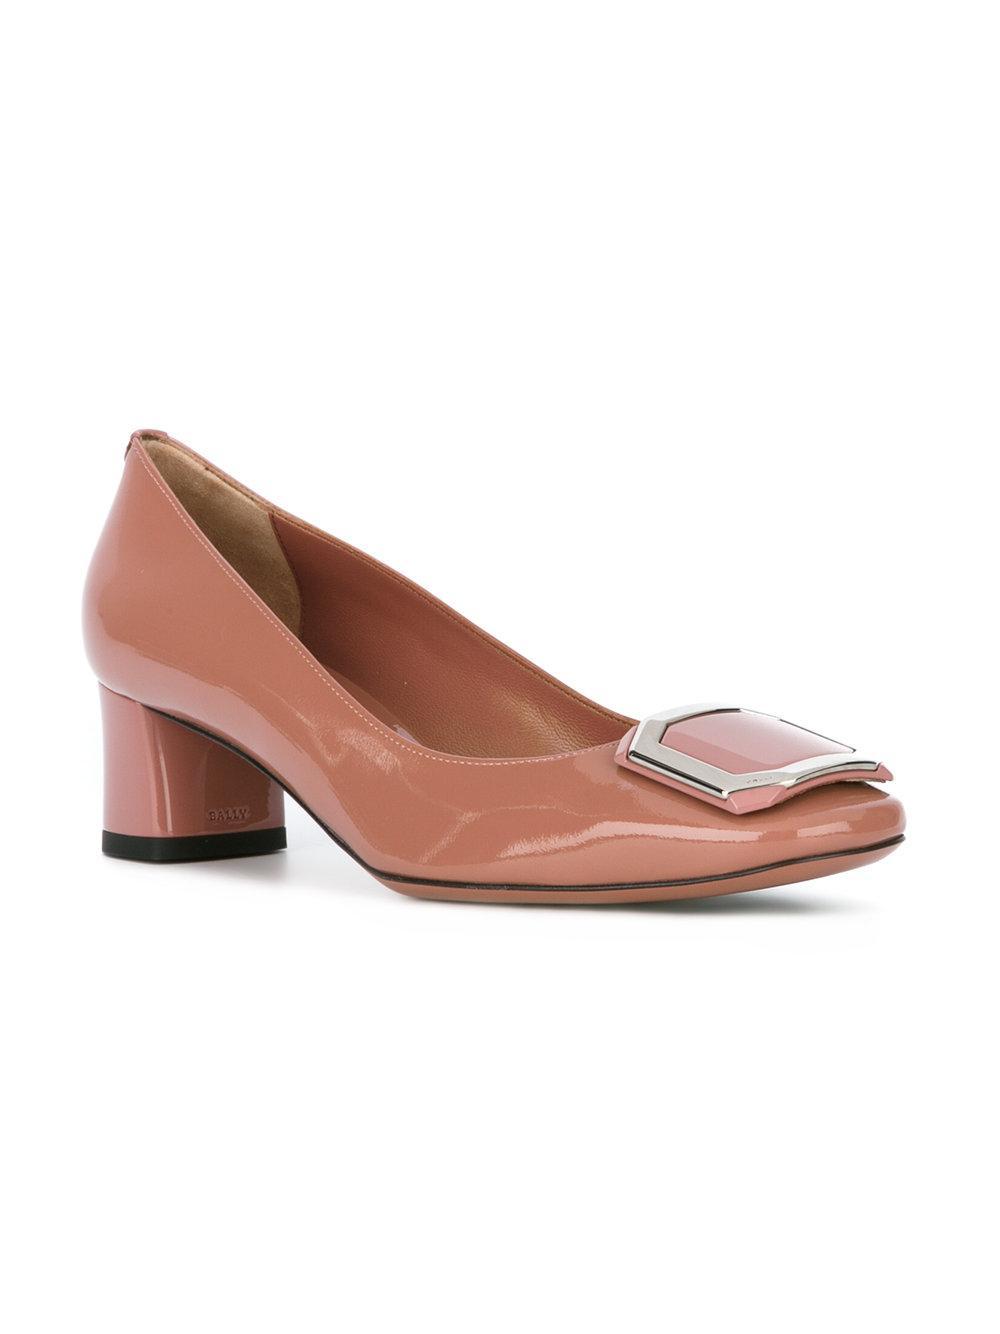 Purple High Heel Court Shoes